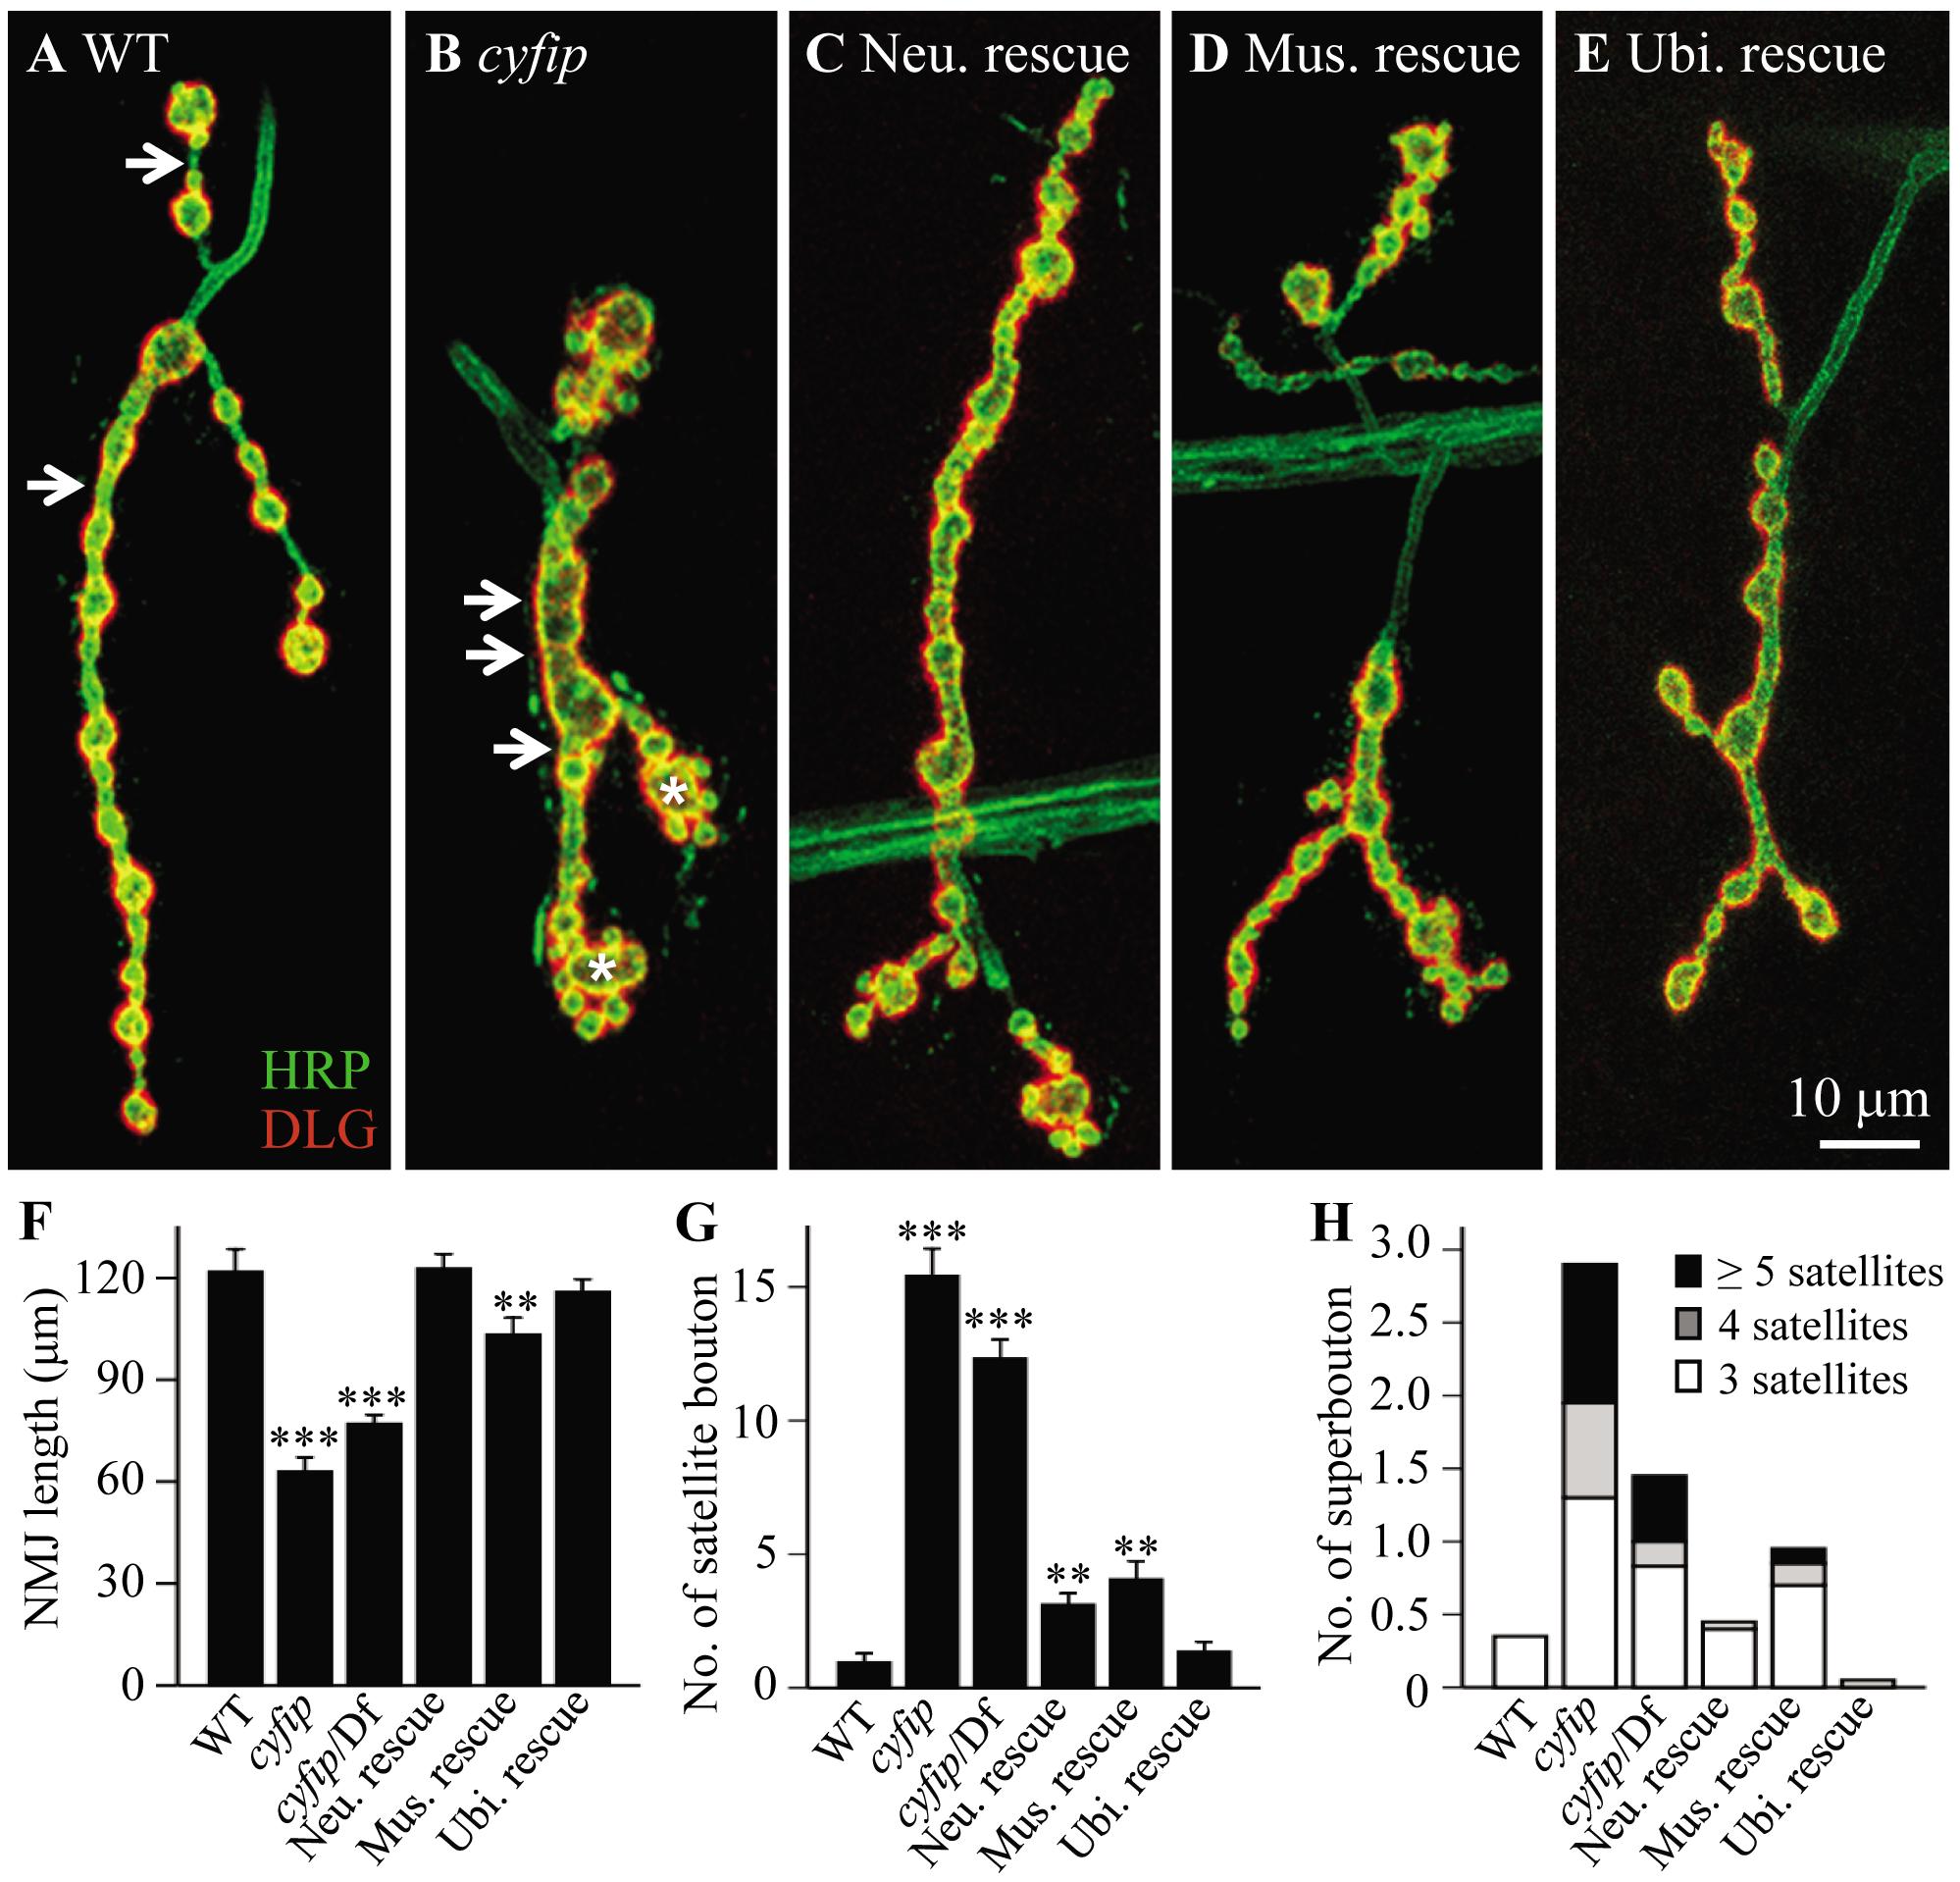 <i>cyfip</i> regulates synapse development.